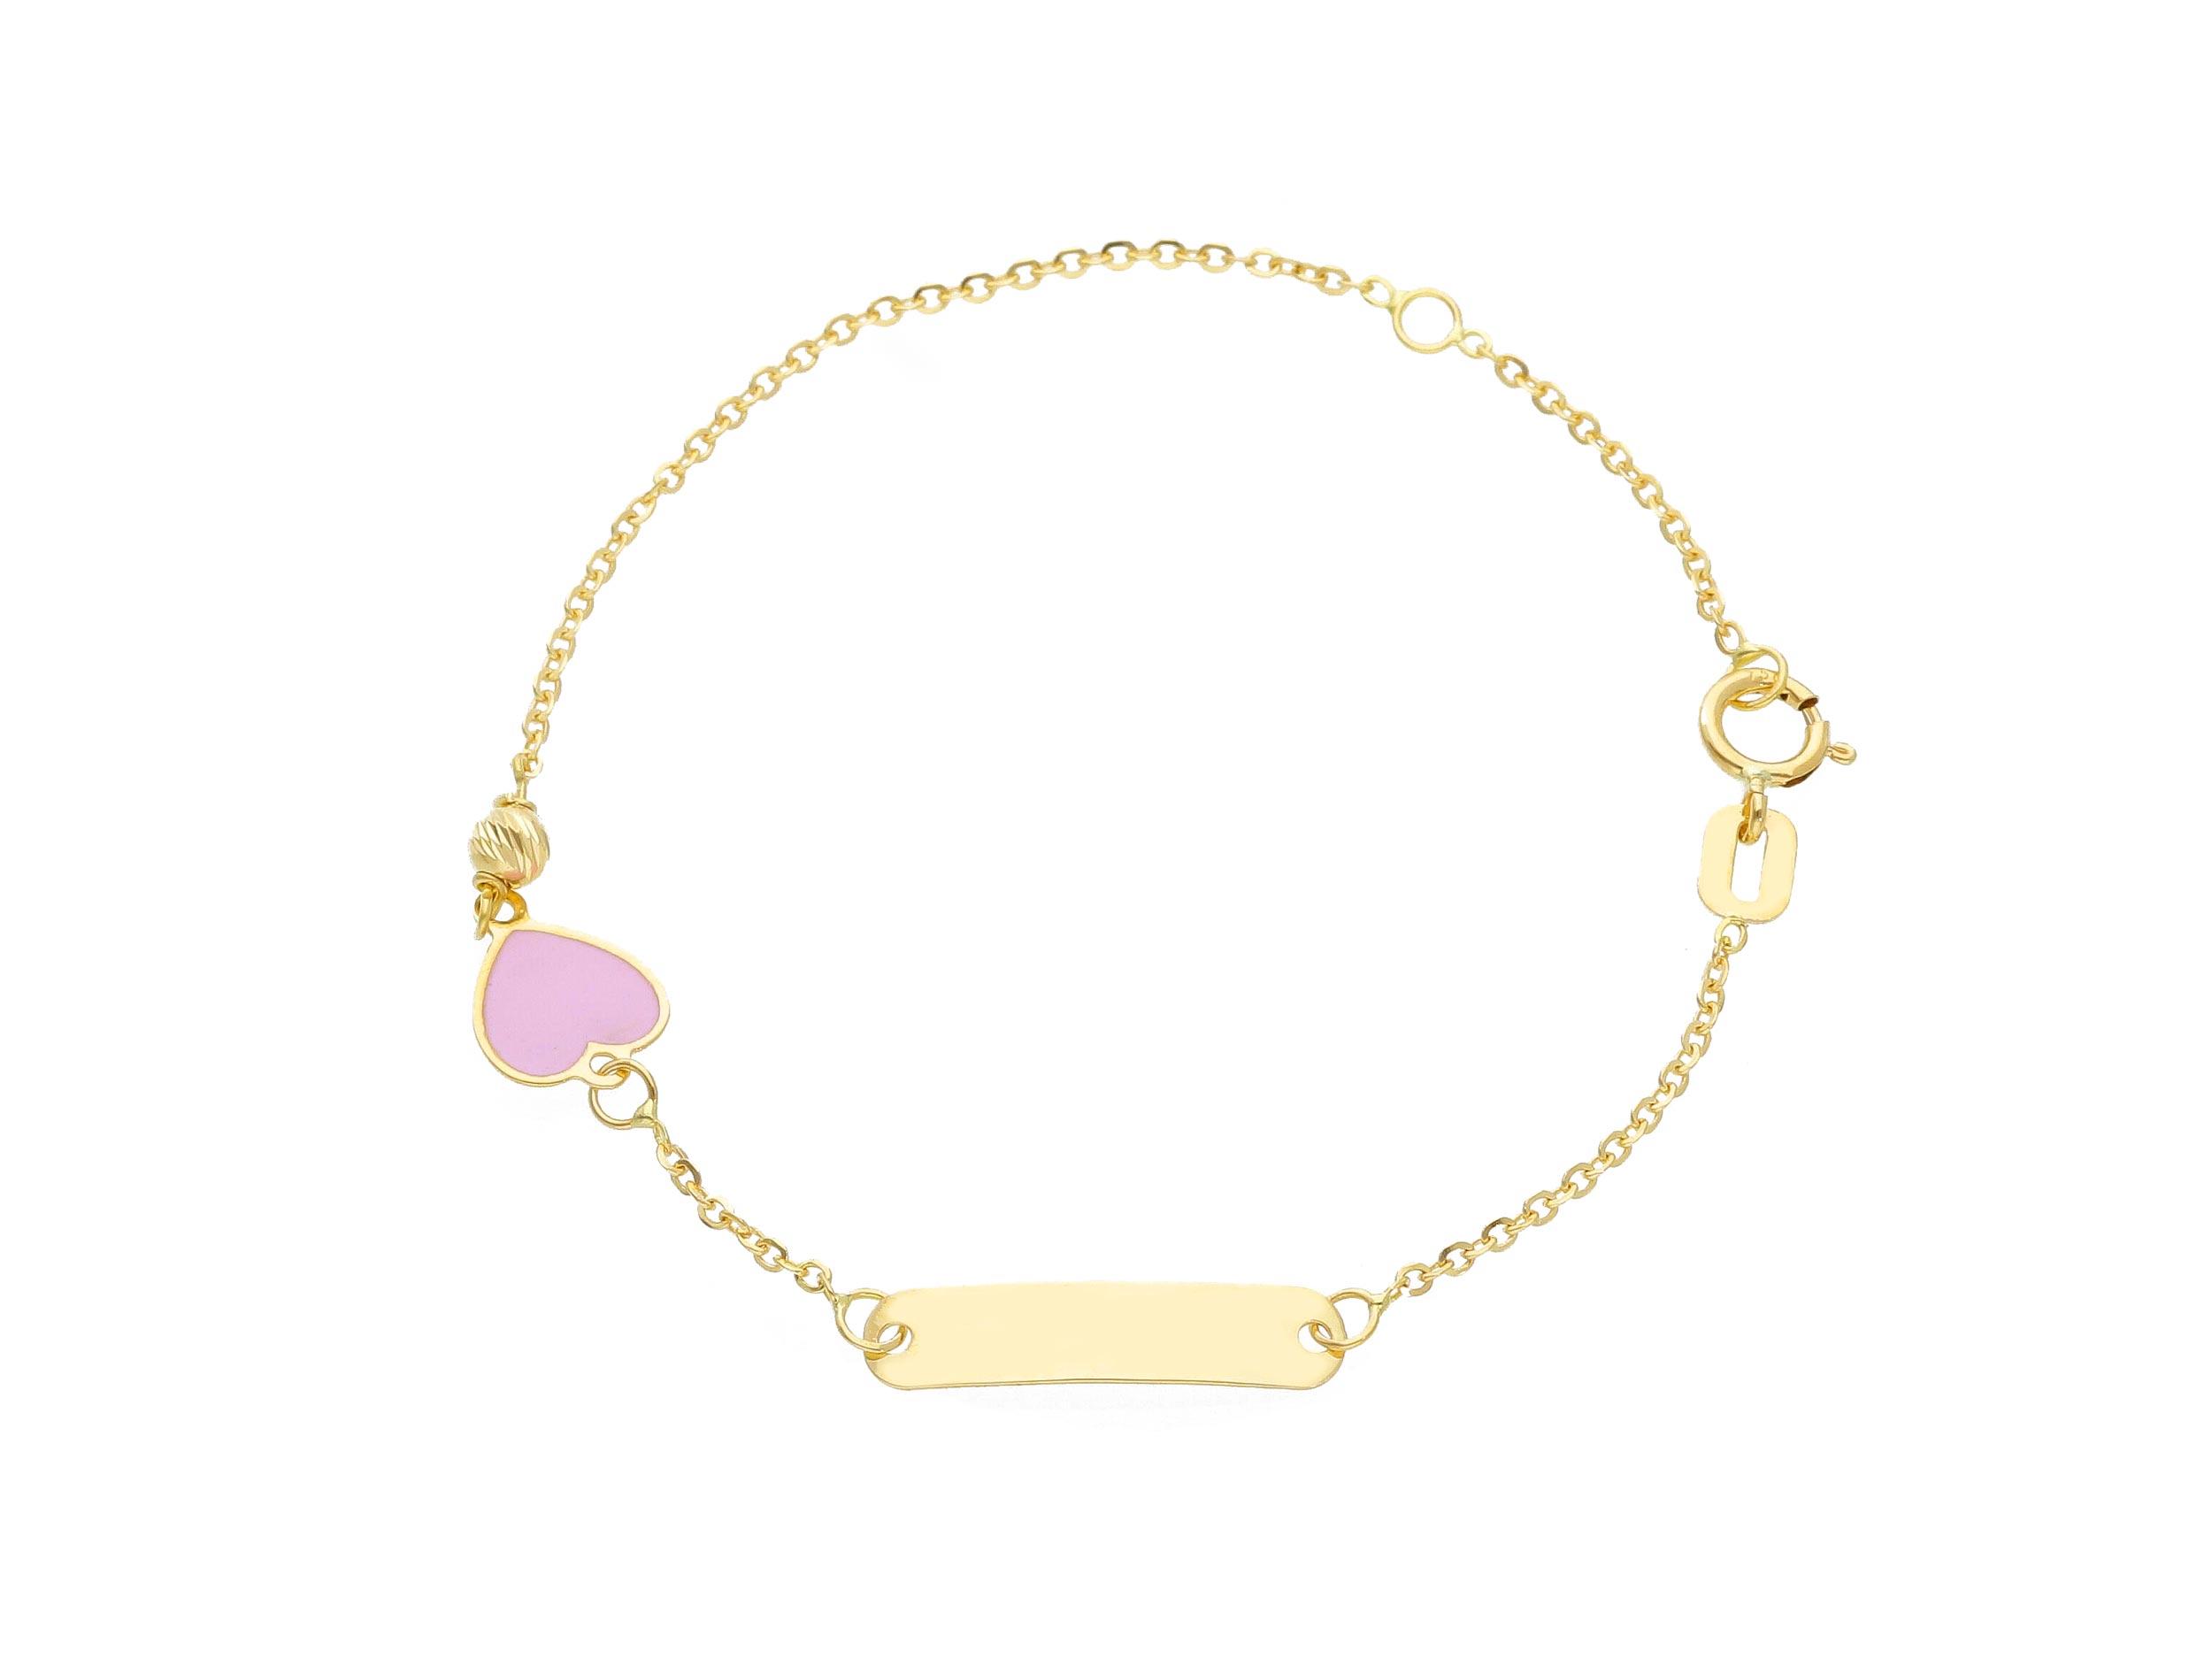 Cute 18ct Yellow Gold 14 cm Bracelet With Enamel